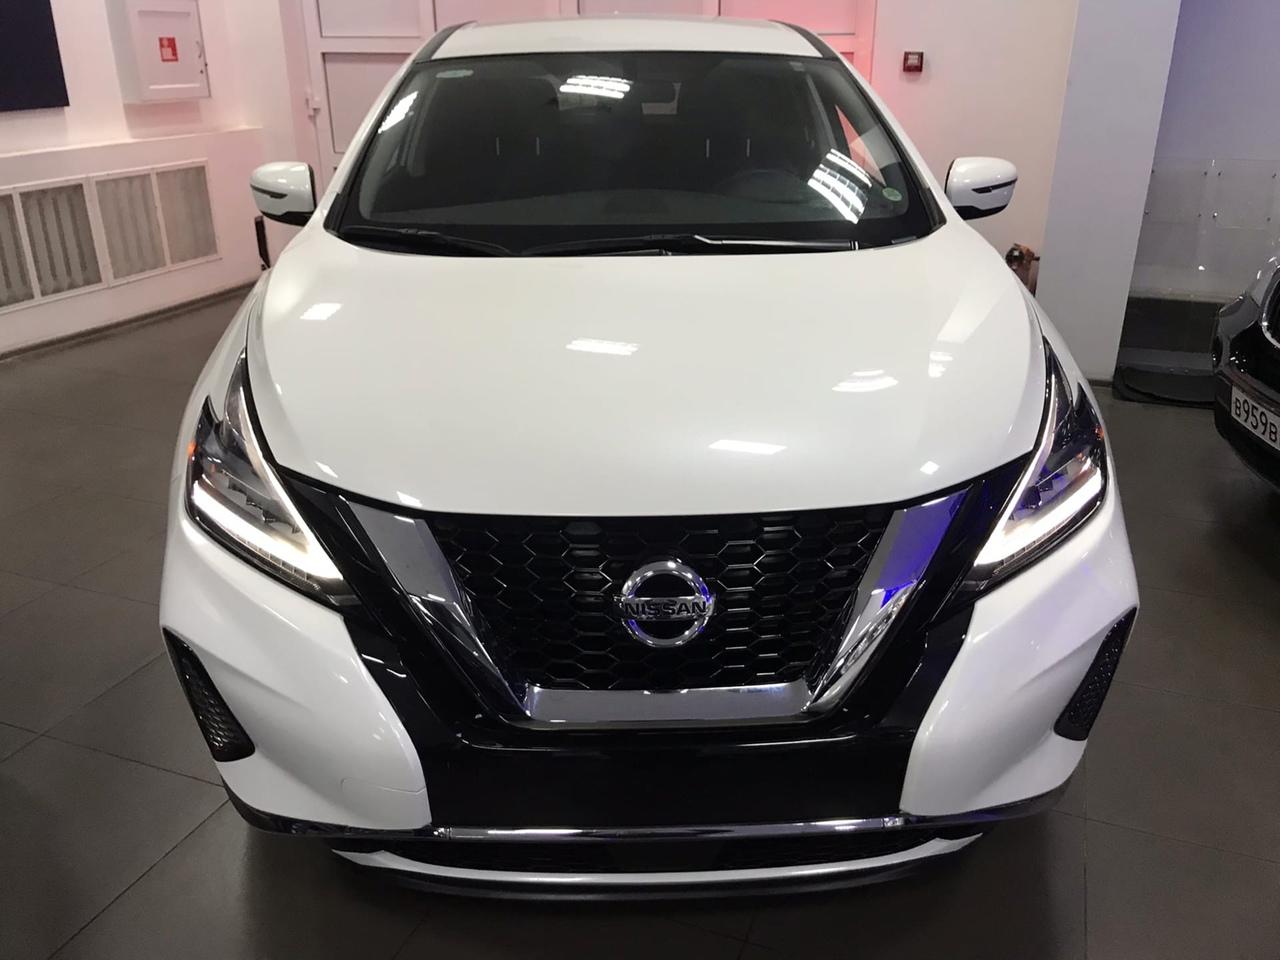 Фотографии Nissan Murano 2019 в автосалоне Автомир